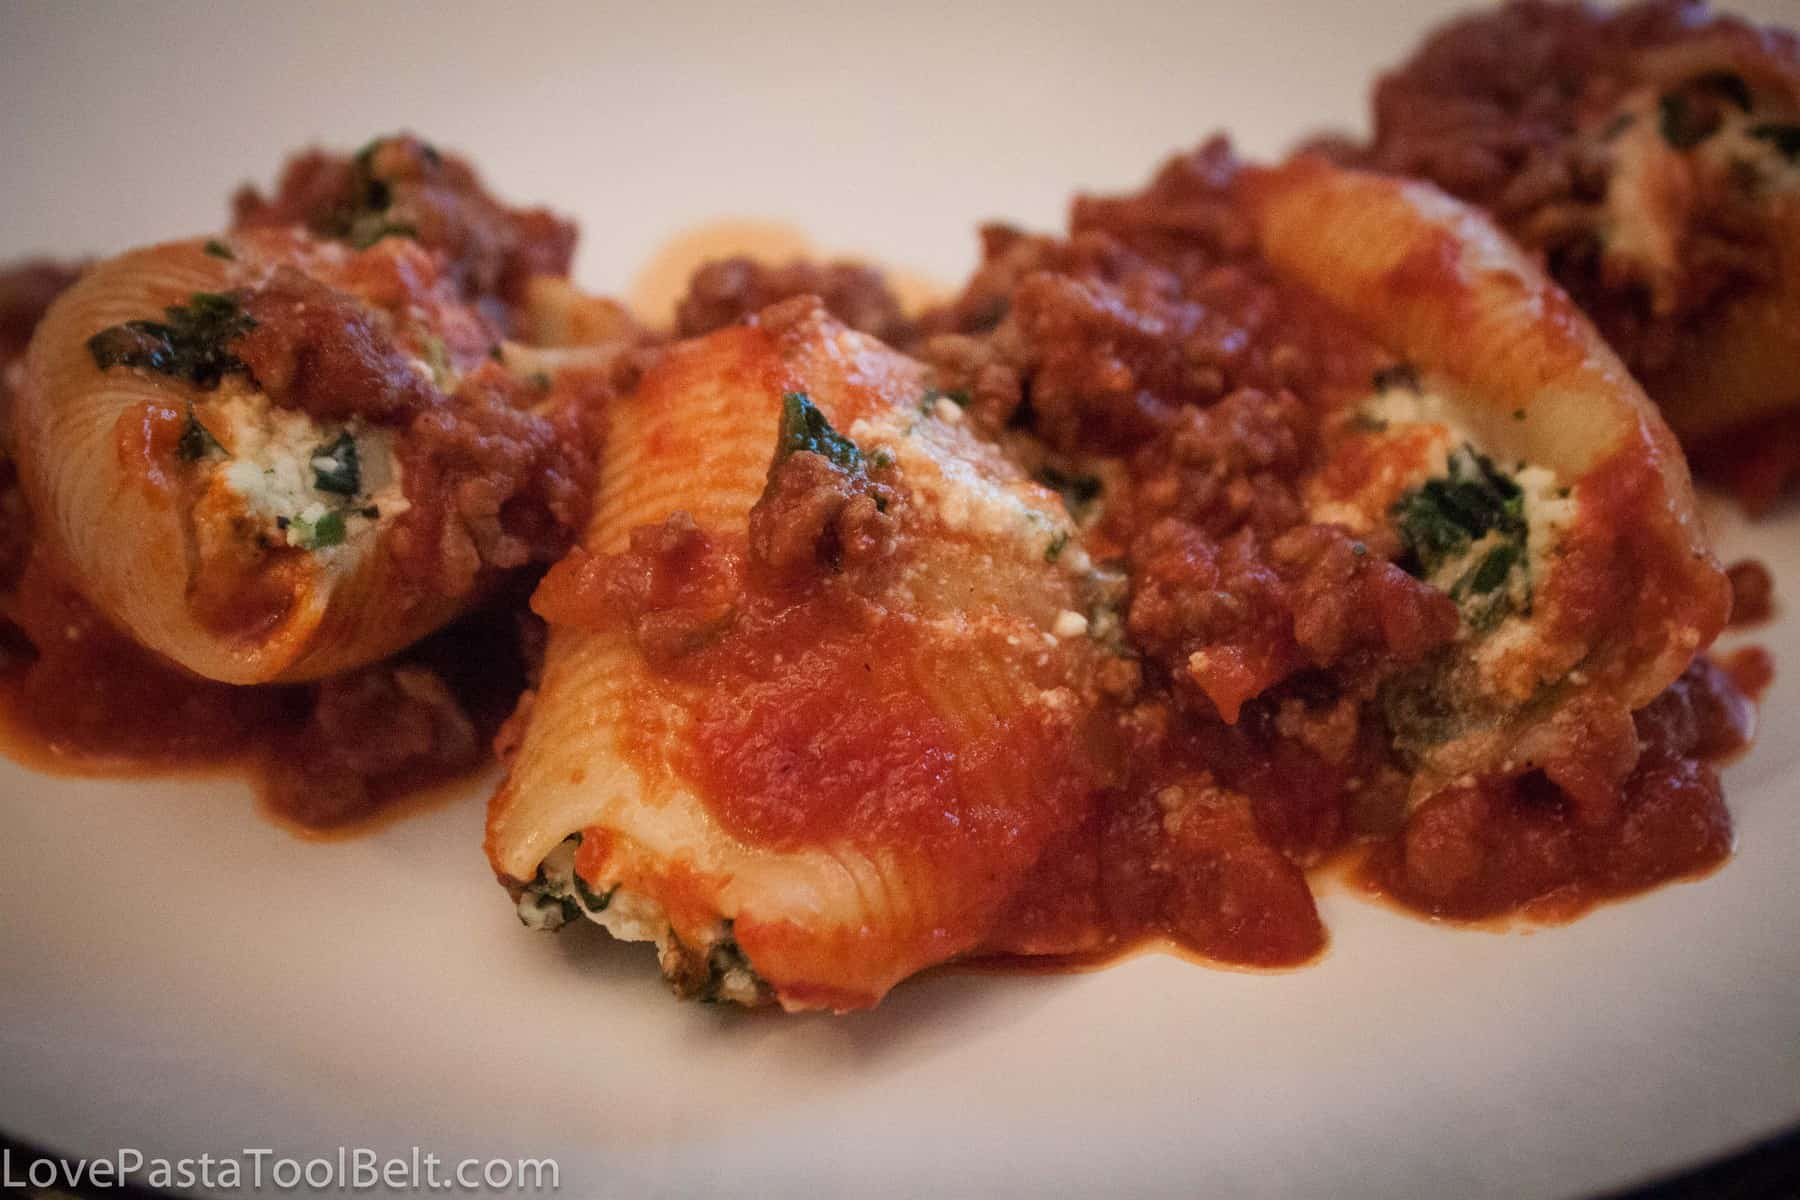 Spinach Ricotta Stuffed ShellsLove, Pasta, and a Tool Belt